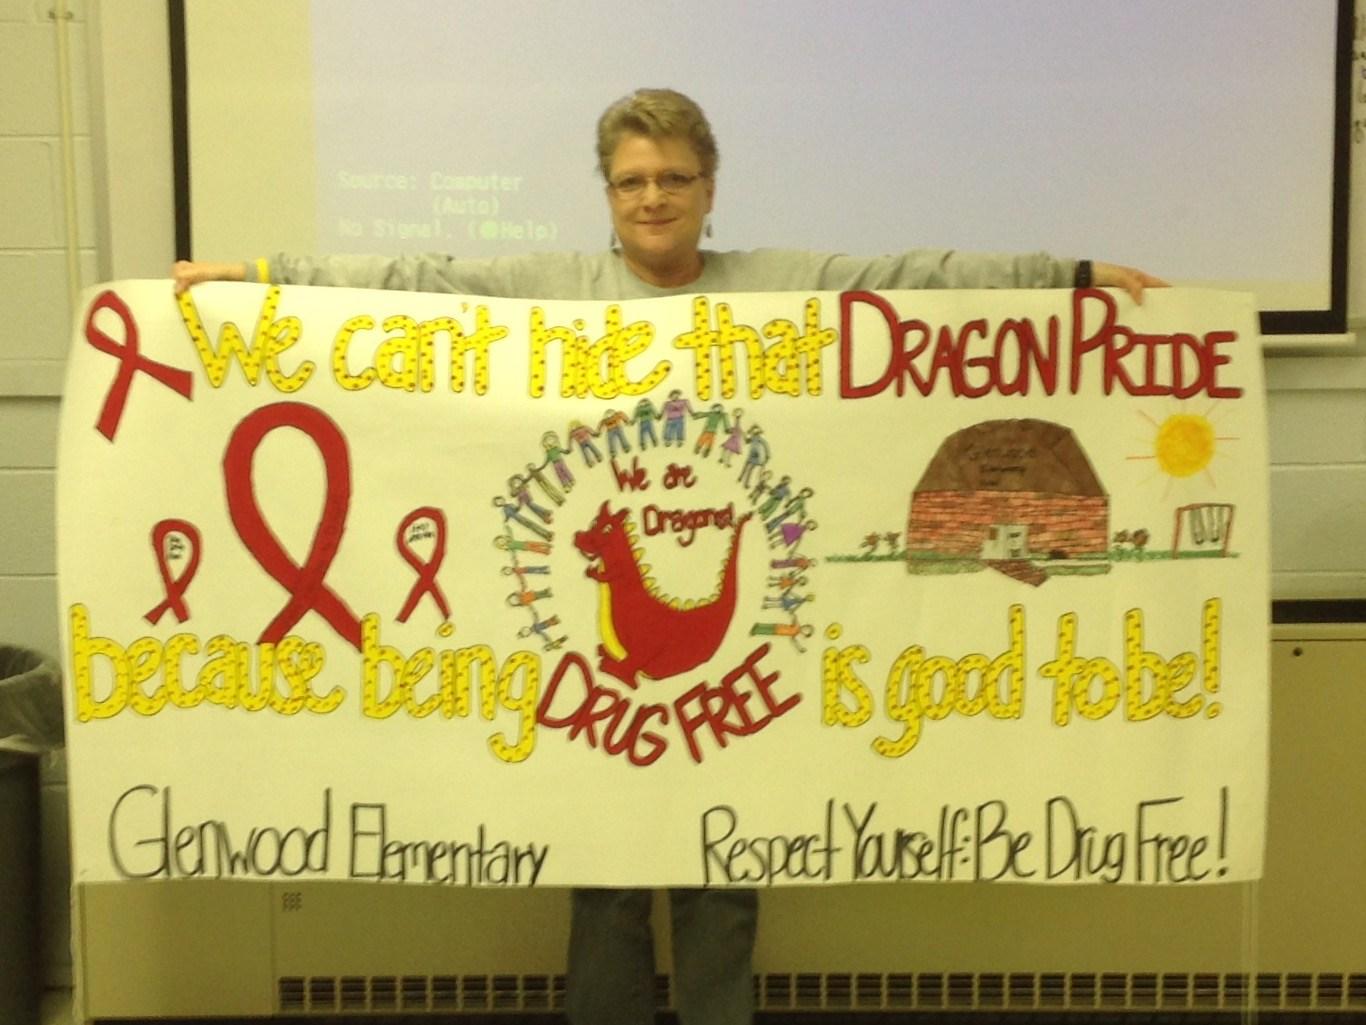 Glenwood Elementary Red Ribbon Week Poster